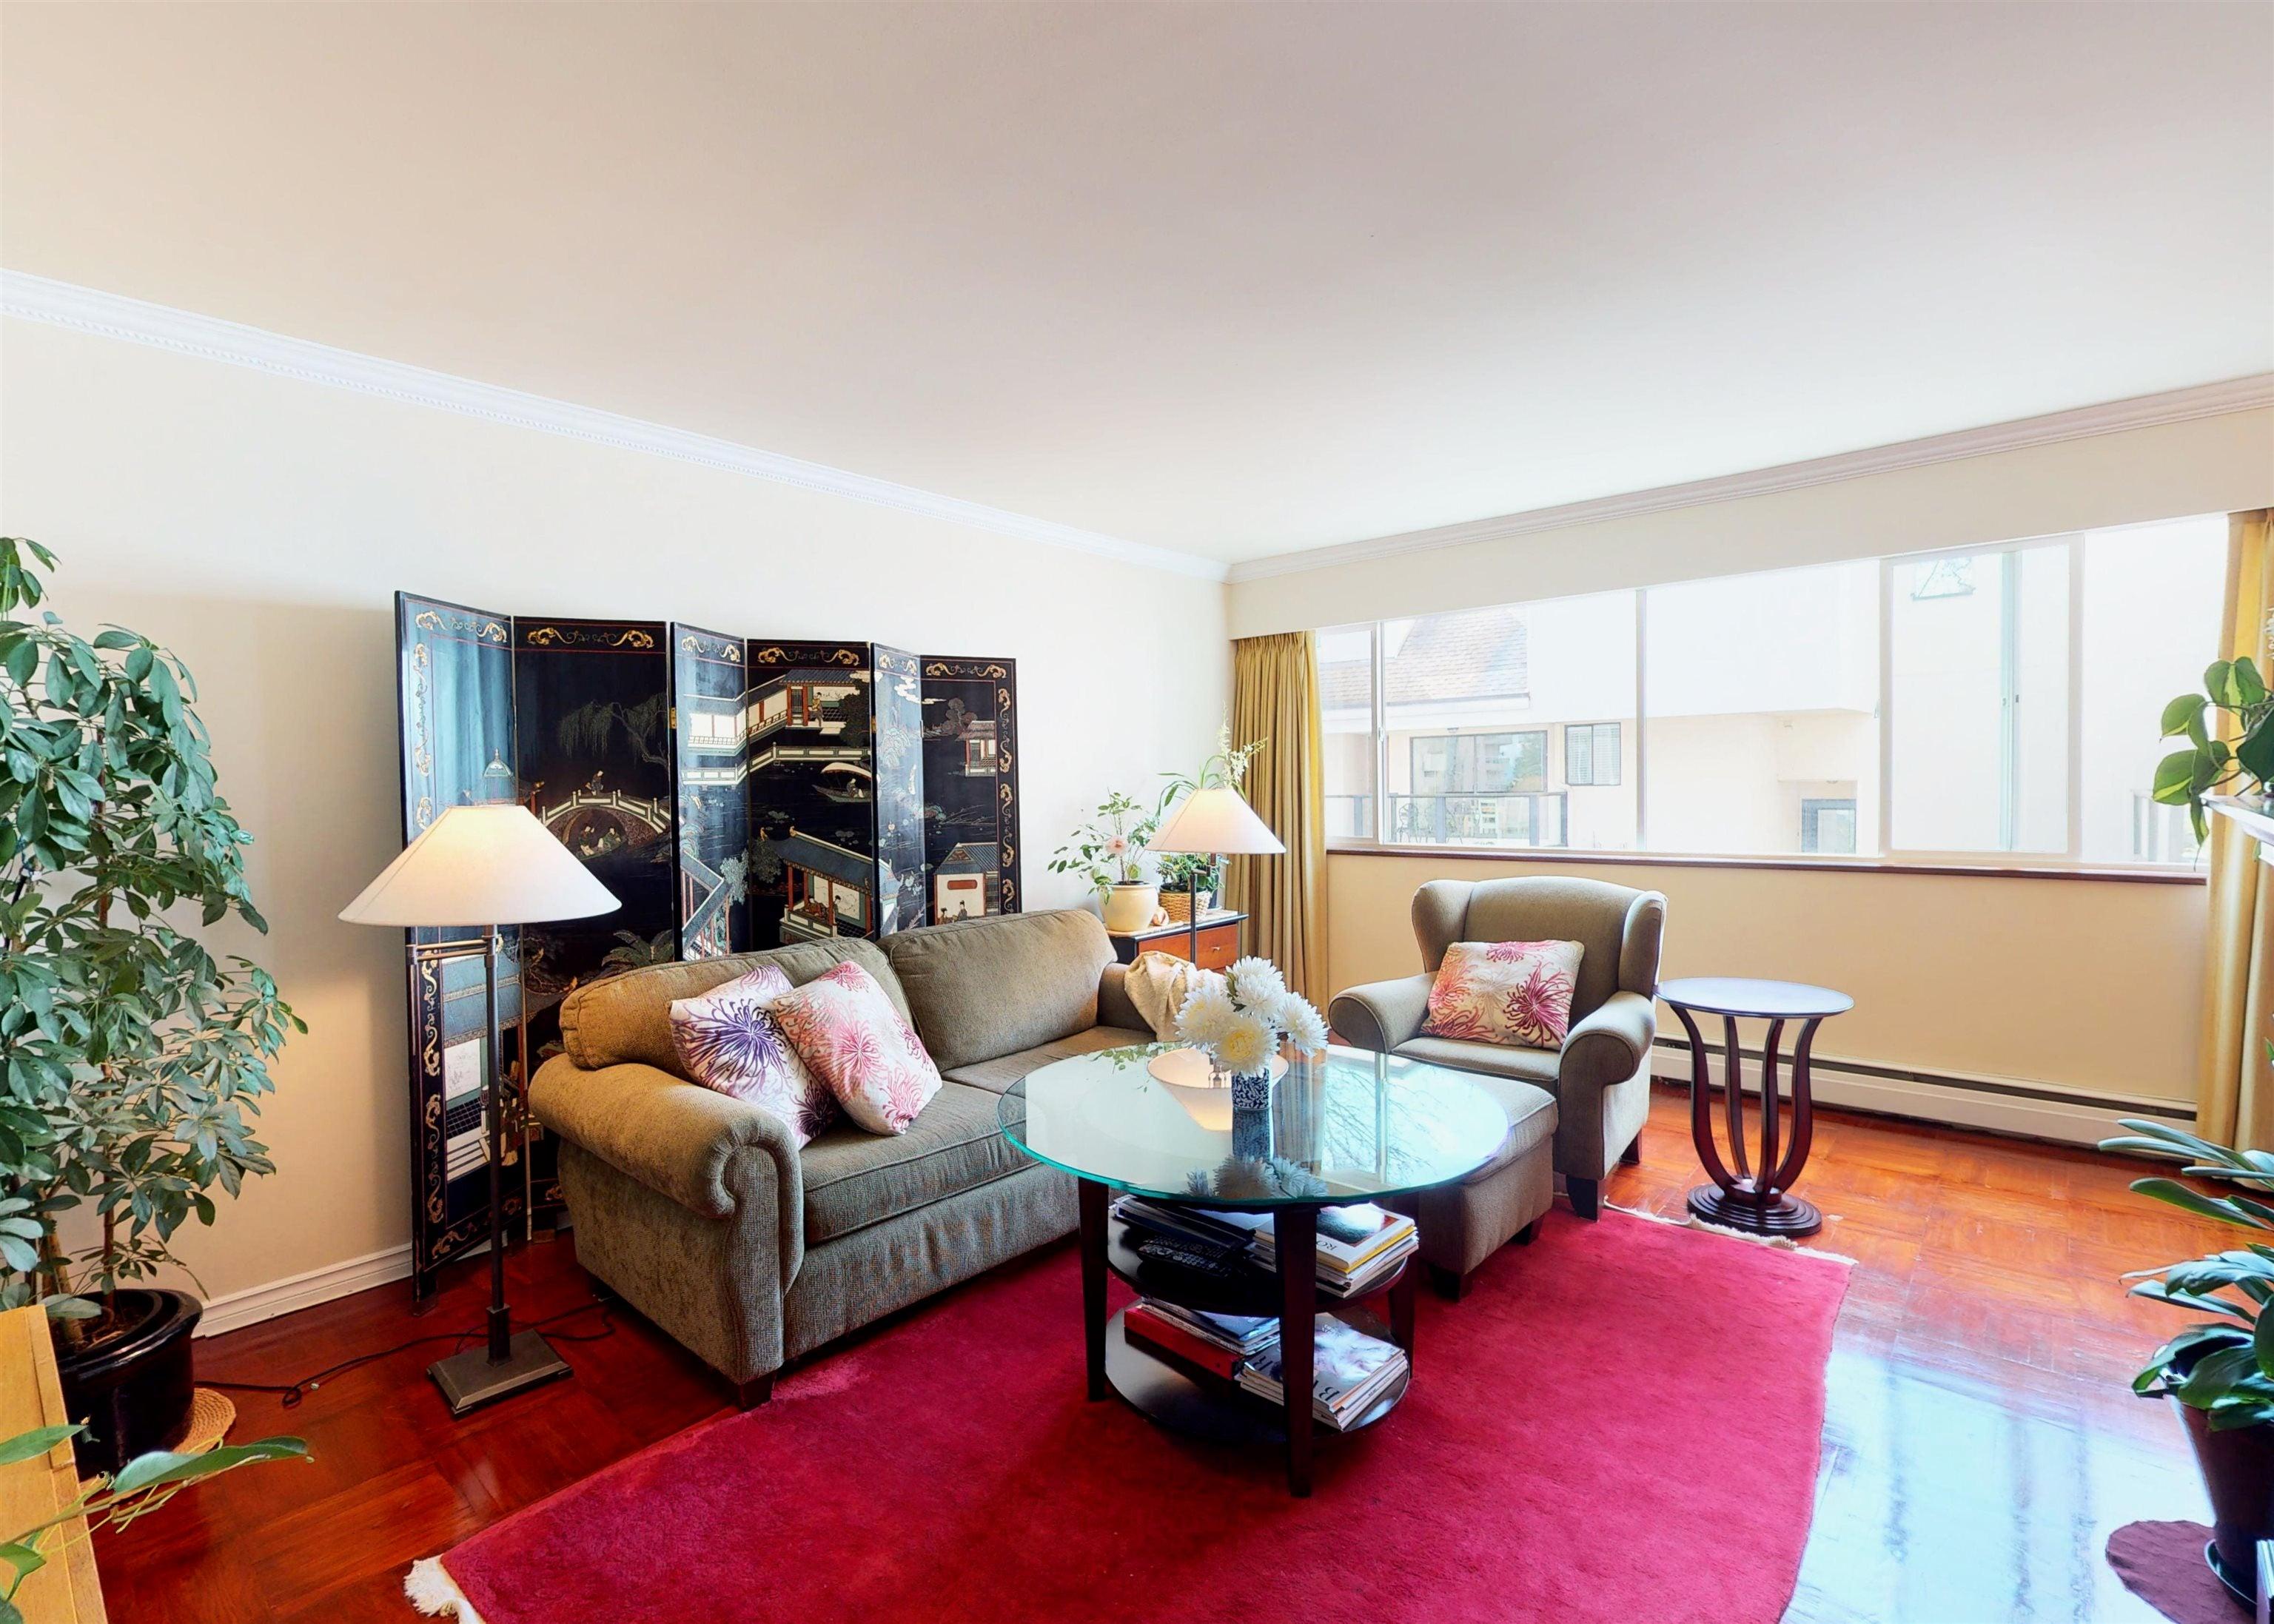 202 1750 ESQUIMALT AVENUE - Ambleside Apartment/Condo for sale, 1 Bedroom (R2610188) - #6